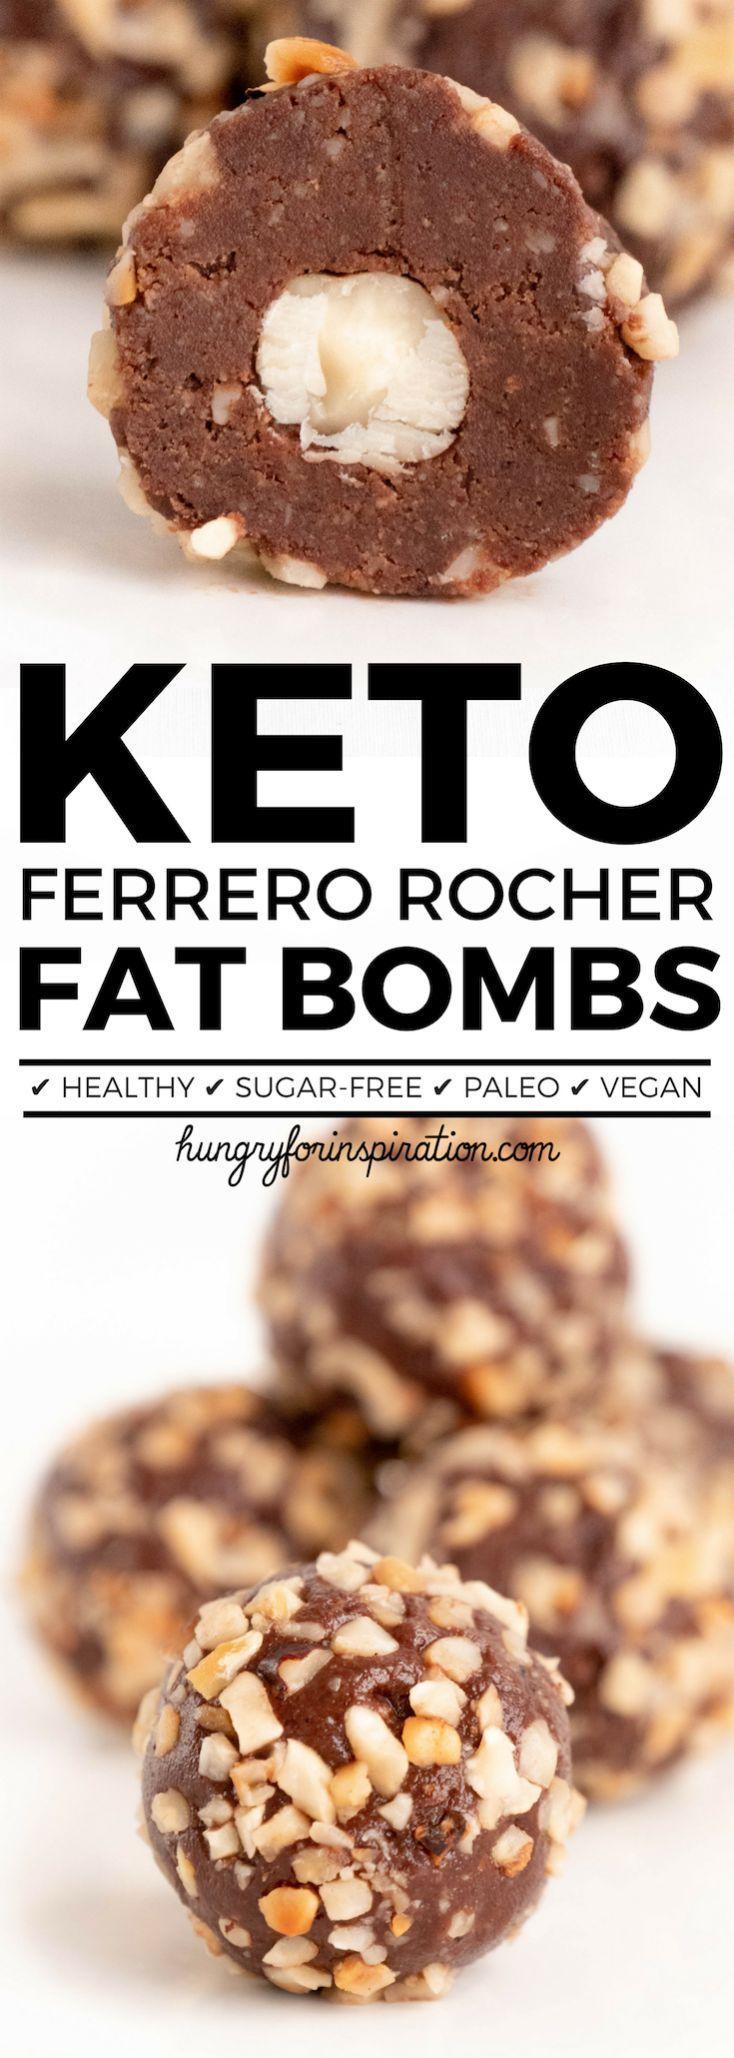 Gesunde No Bake Ferrero Rocher Keto Fettbomben (Keto Dessert, Low Carb Desserts, …